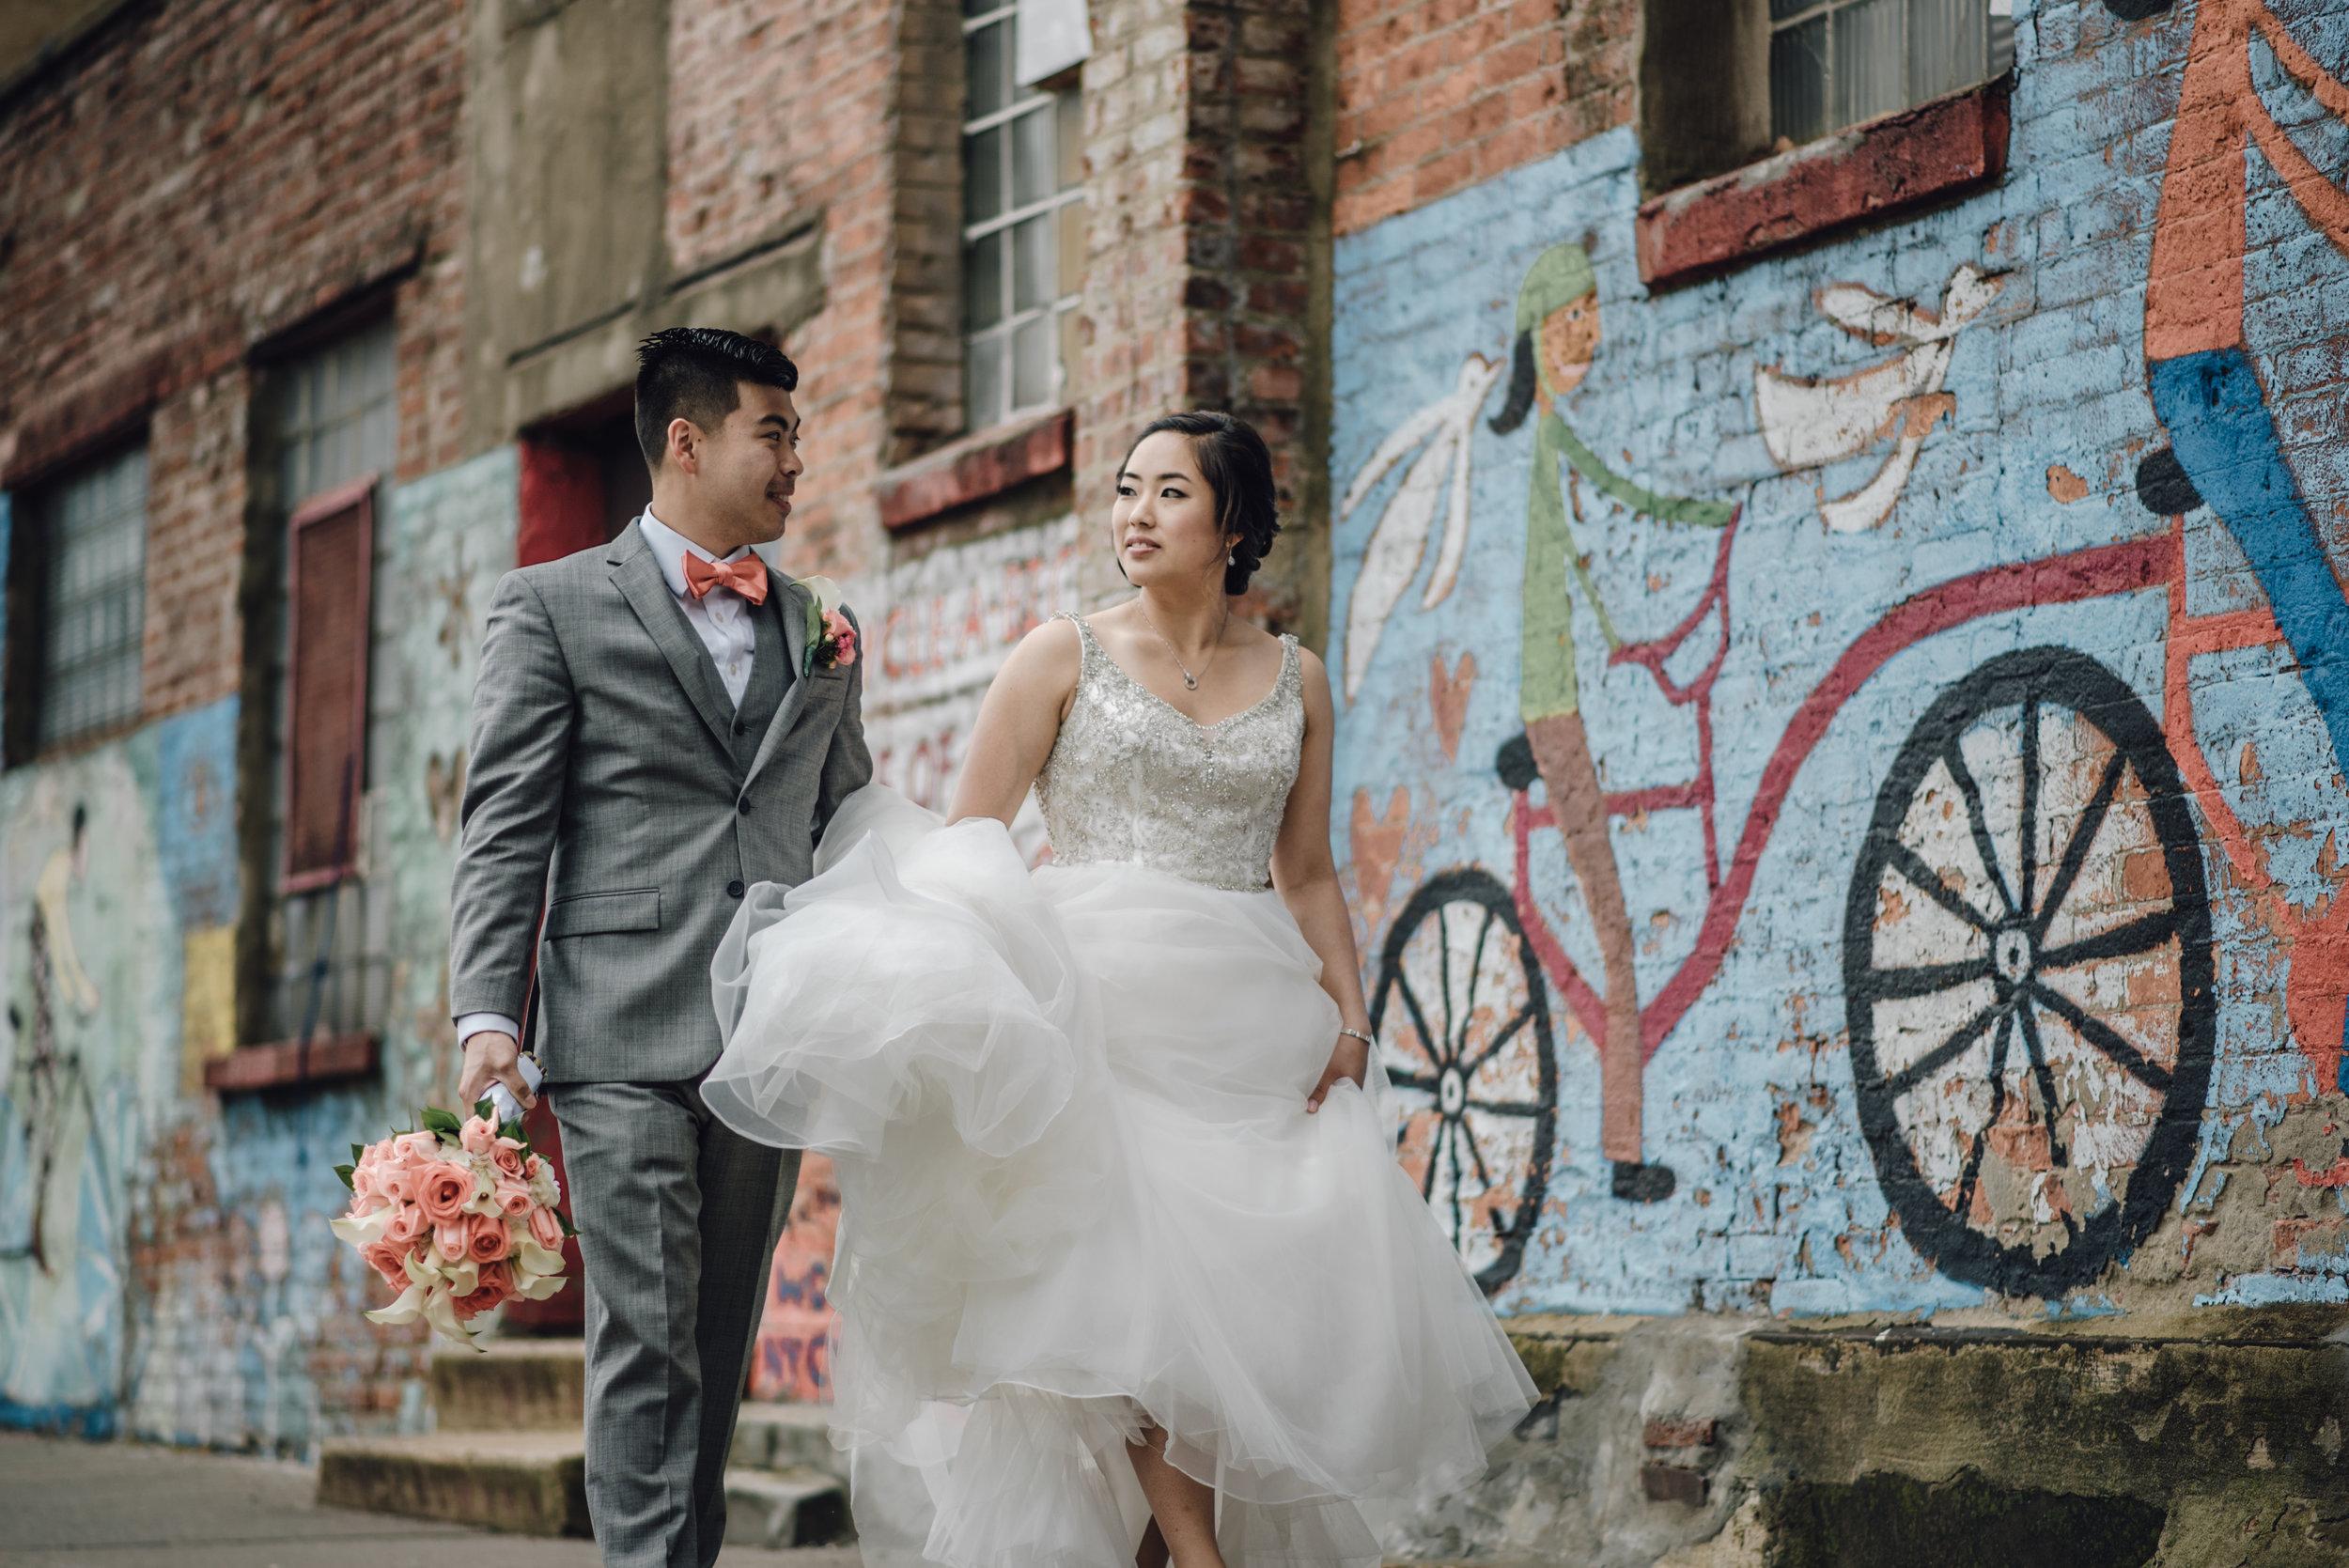 Main and Simple Photography_2017_Weddings_NewYork_TinaJon-409.jpg